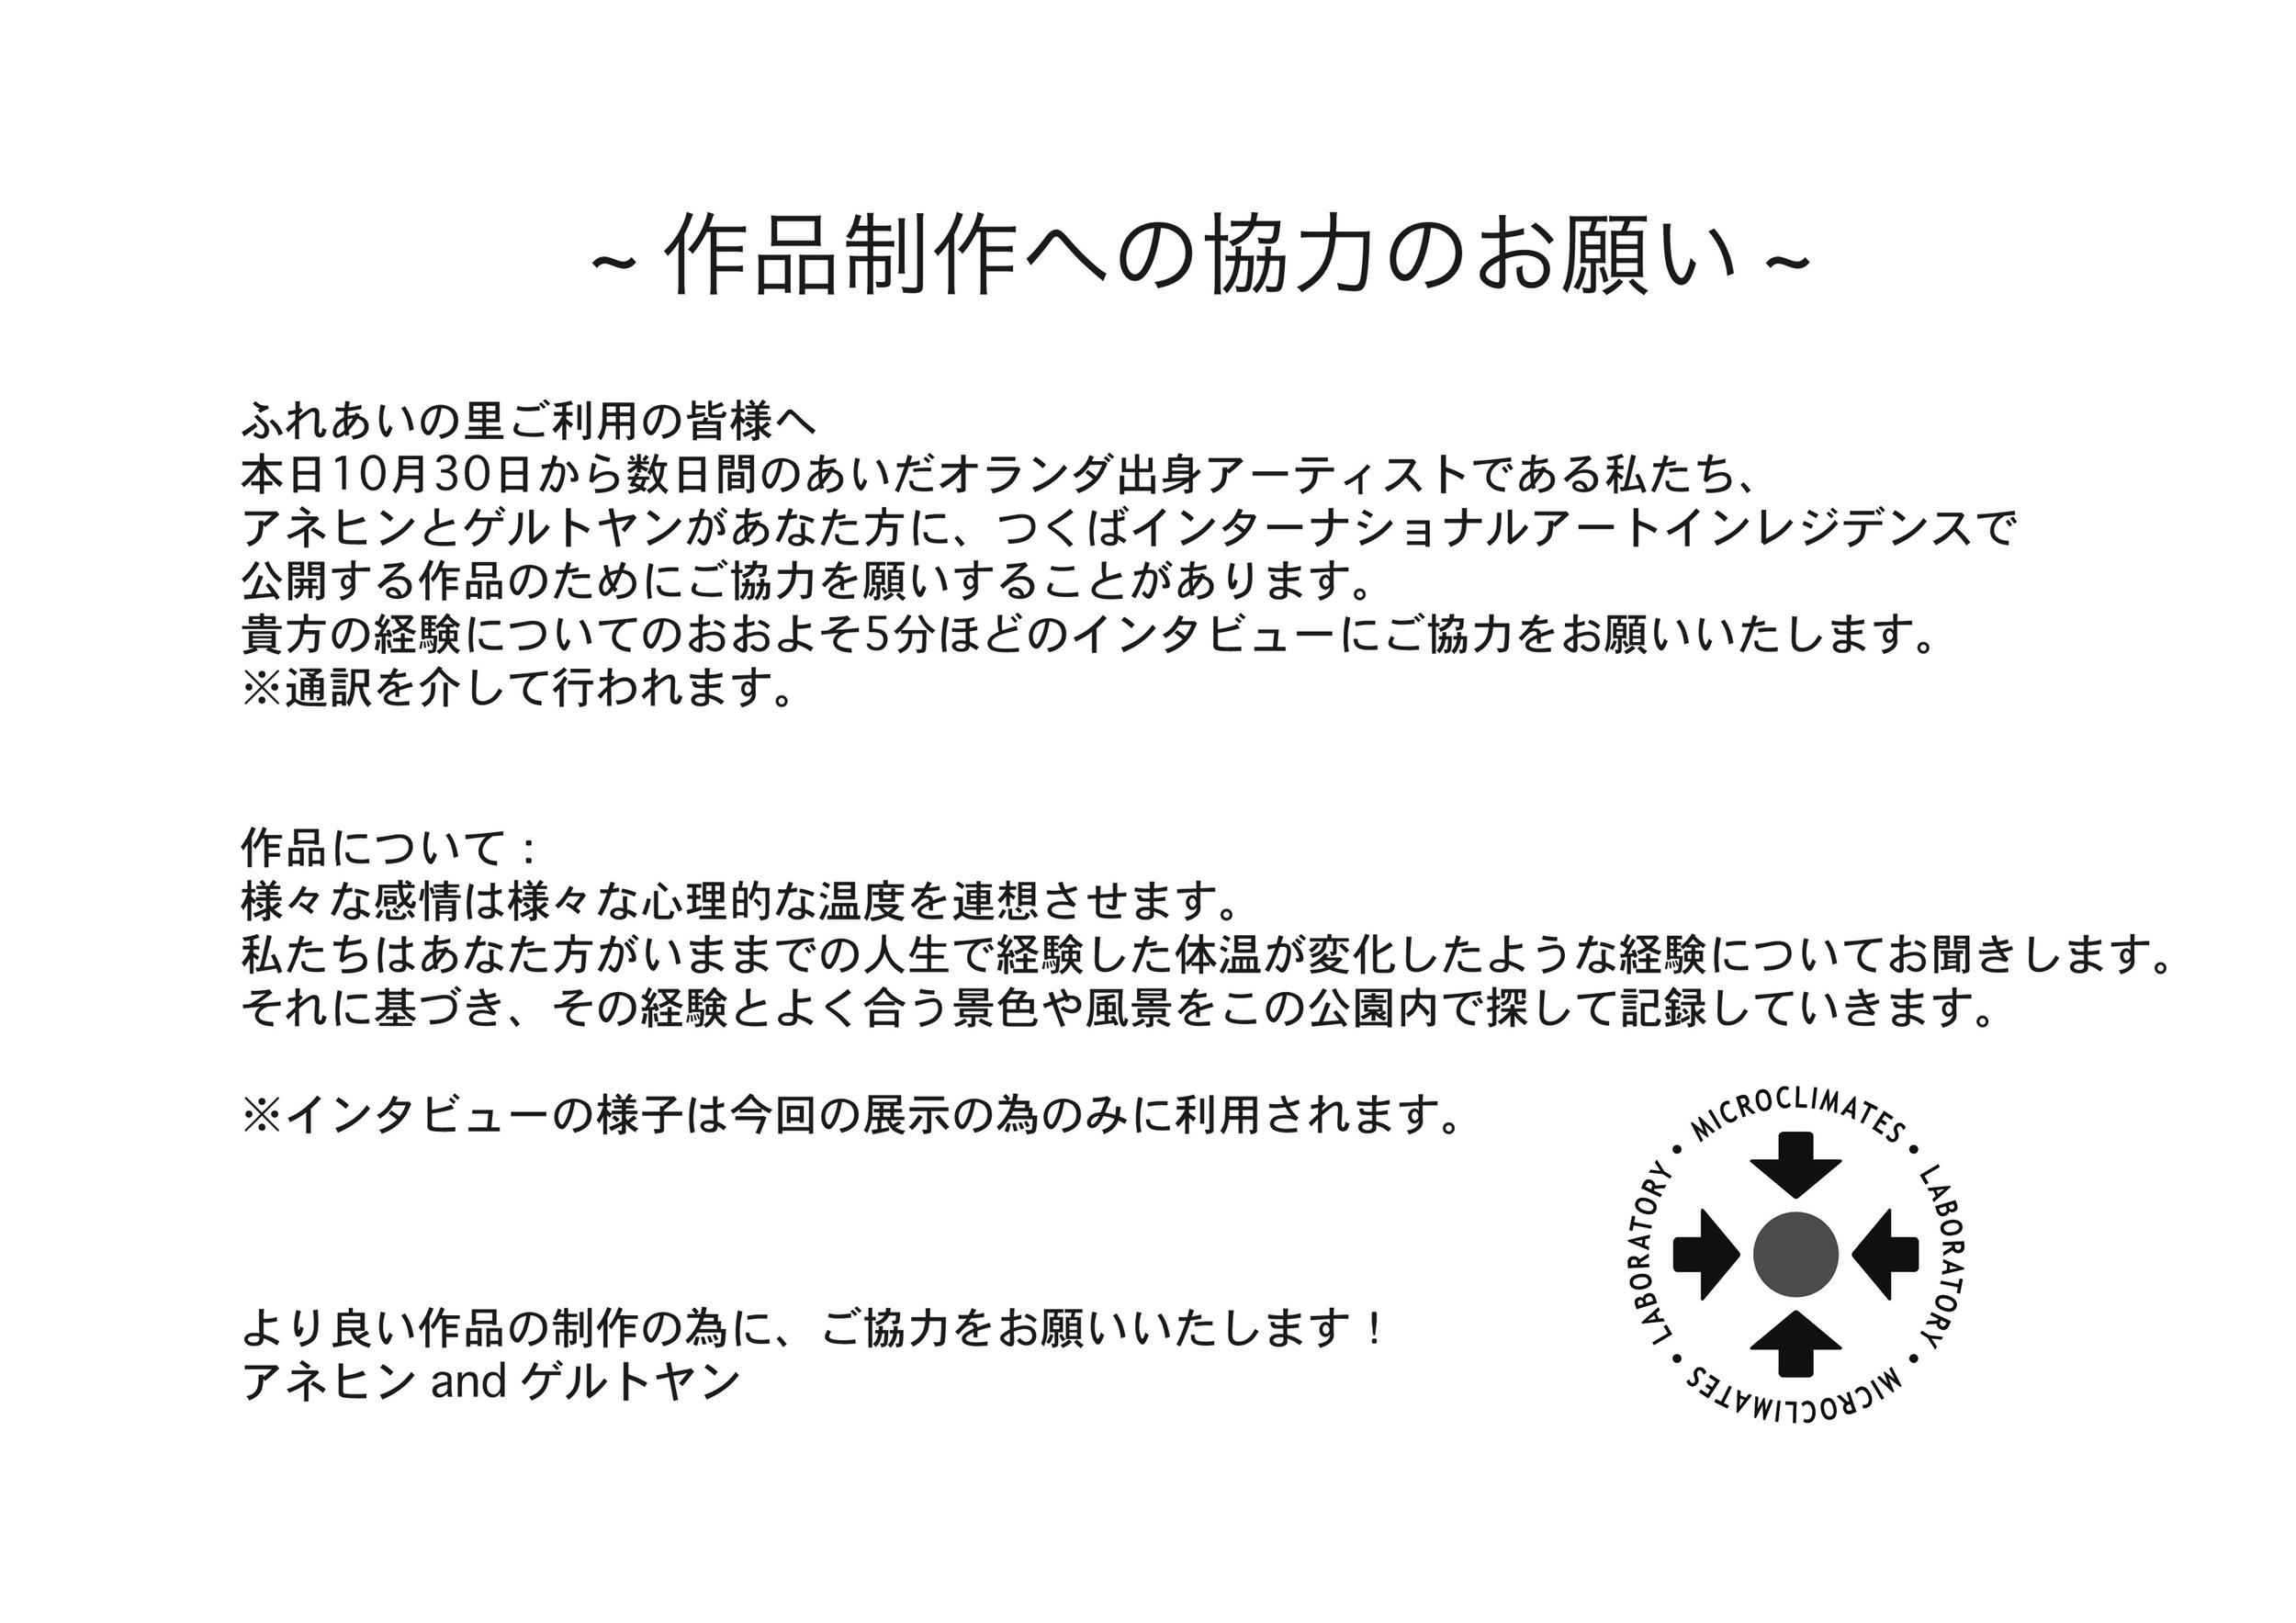 tekst Japan.jpg